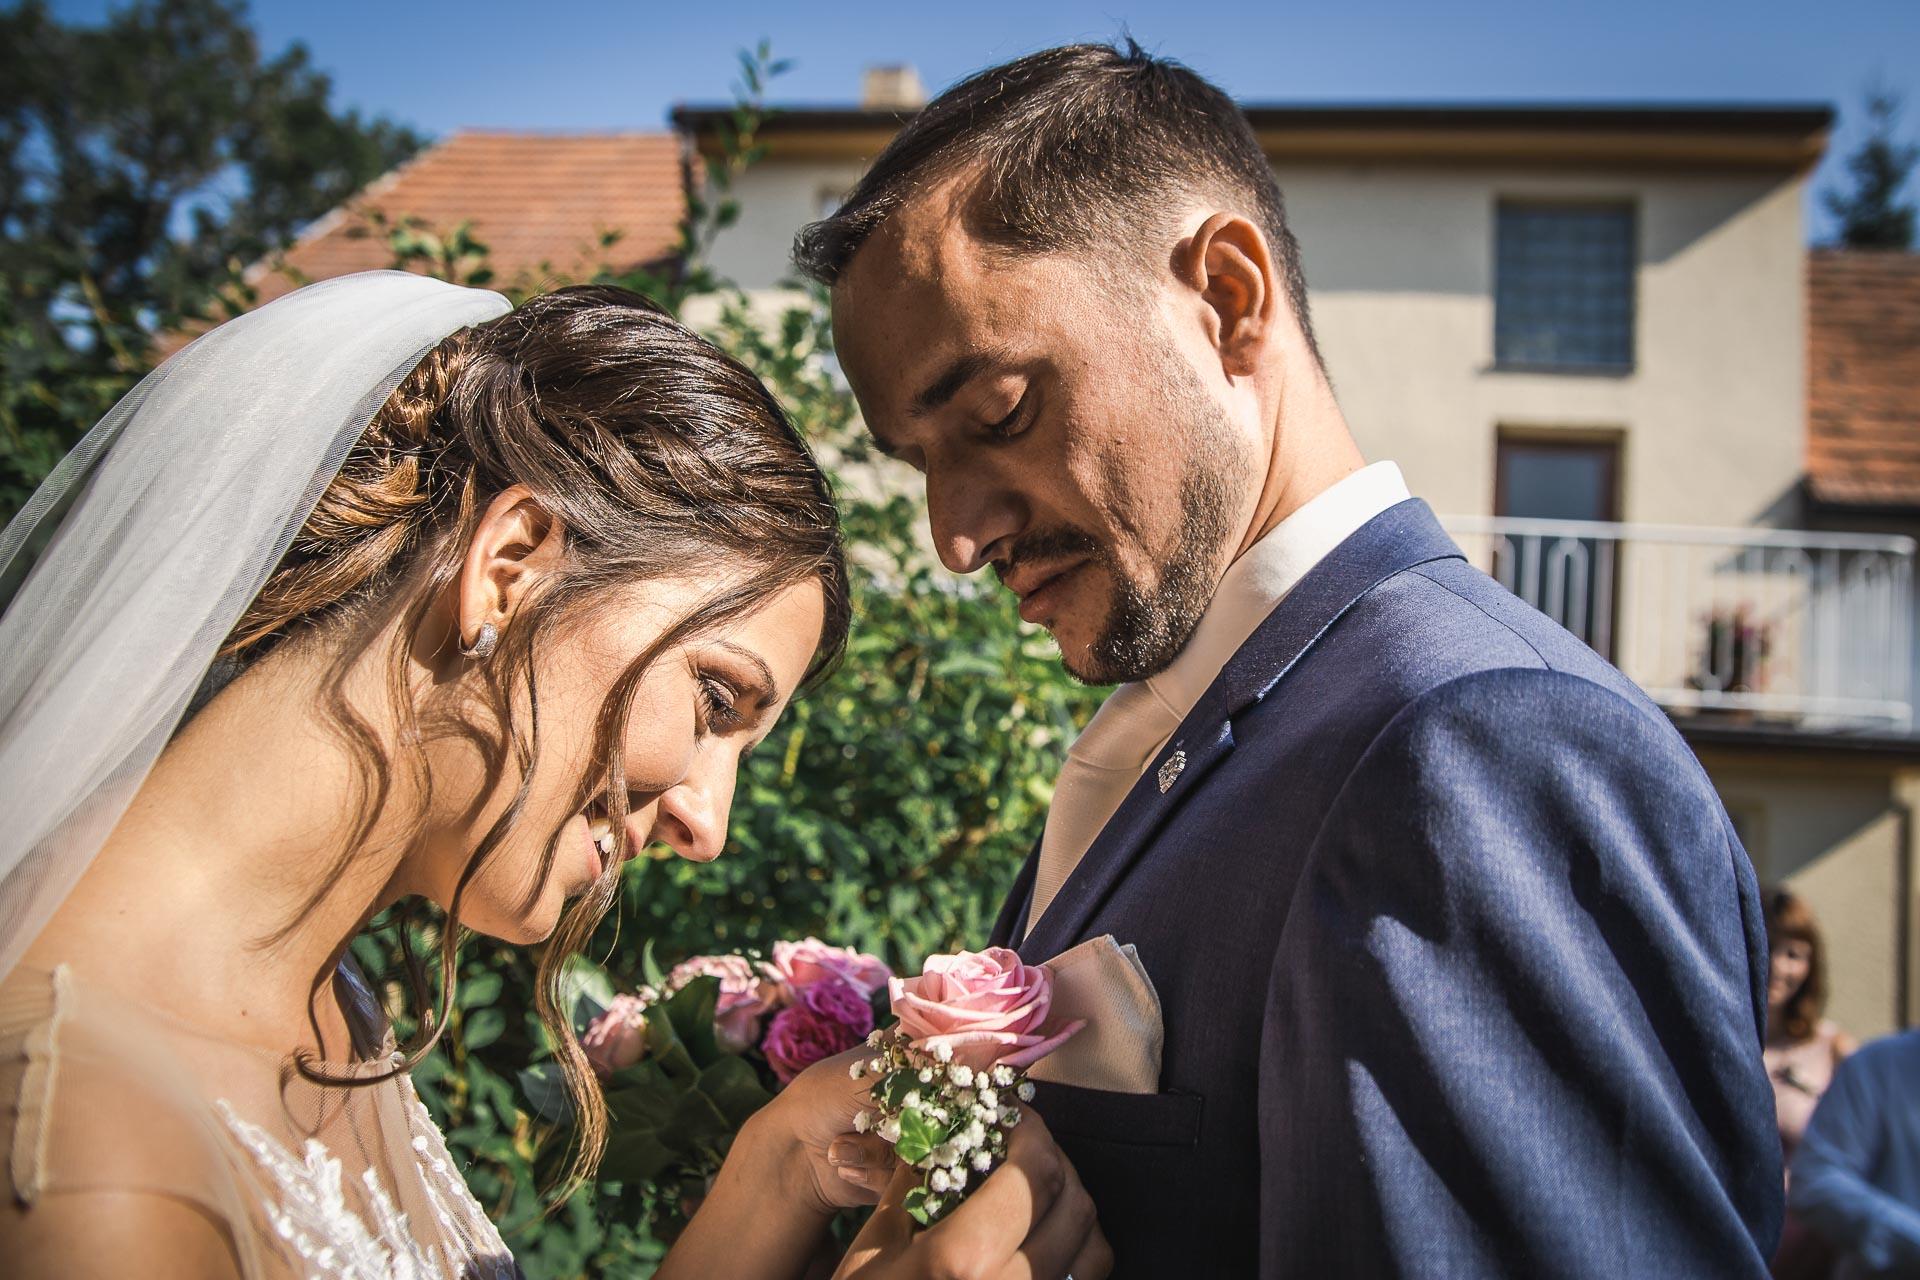 svatební-fotograf-wedding-svatebni-video-orlík-vltava-kostel-statek-stodola-boho-svatba-Beautyfoto-126